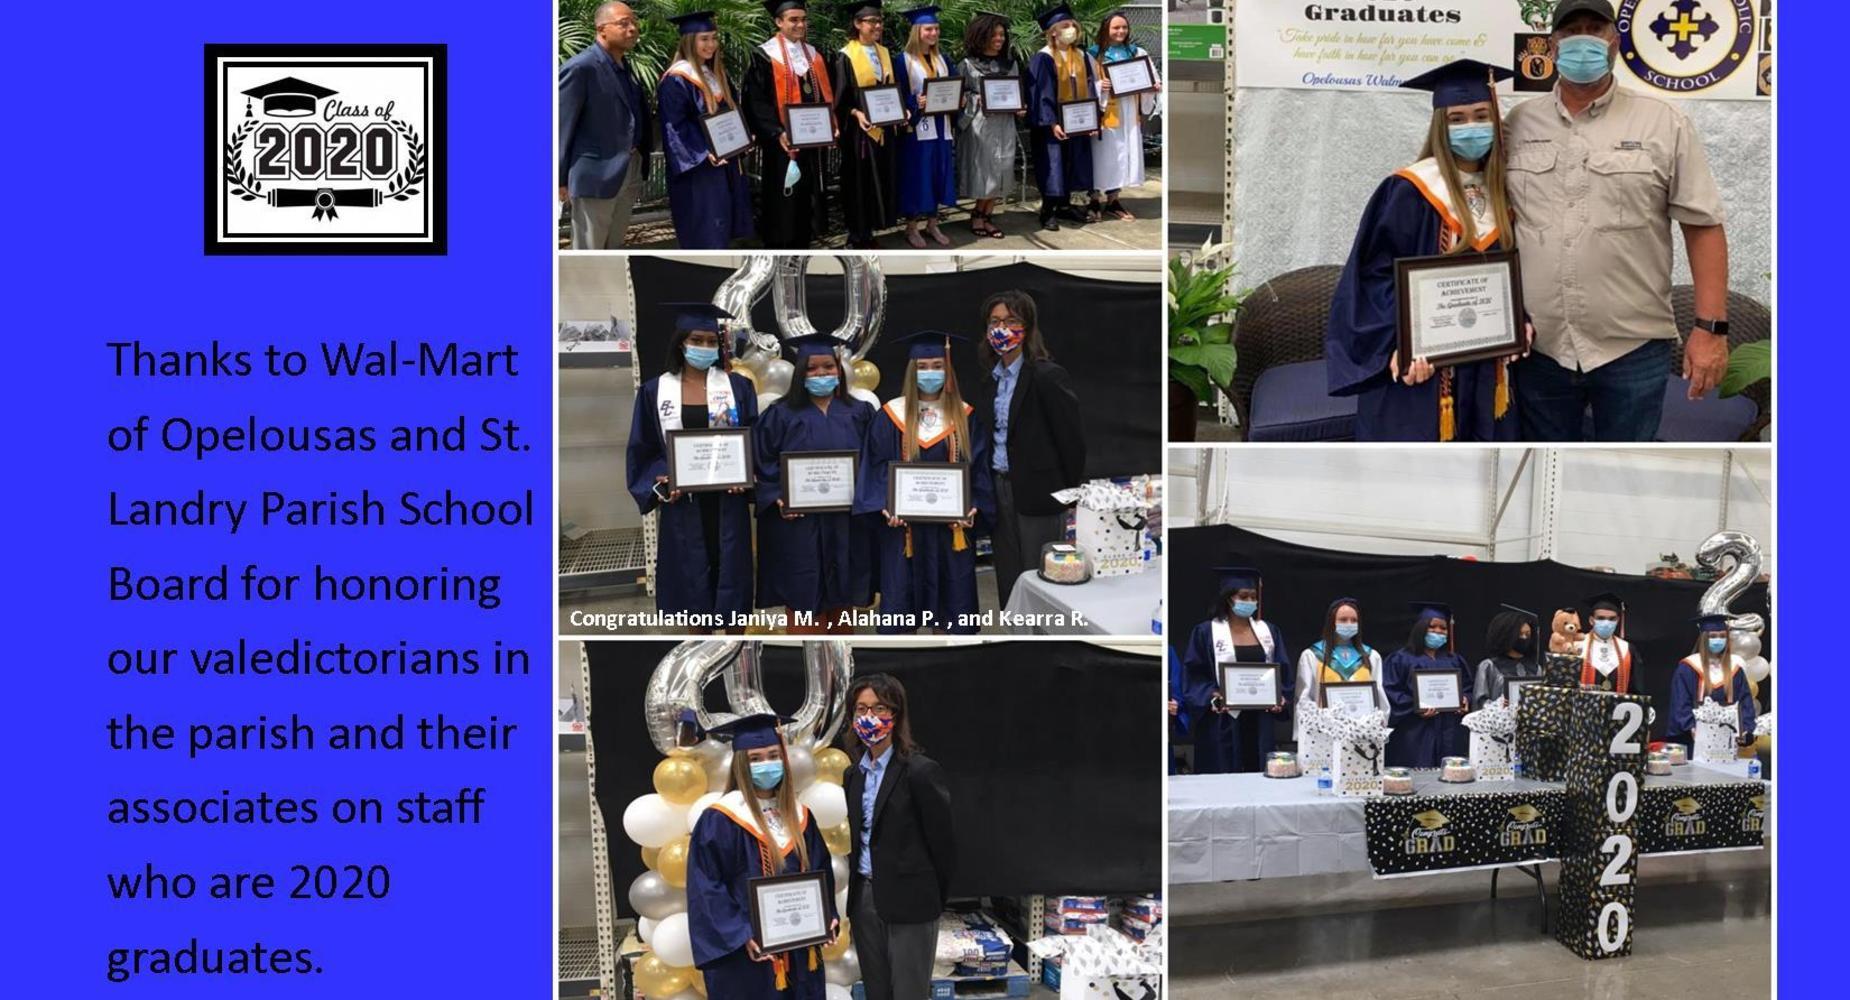 Wal-Mart-Appreciative Day-Valedictorians of the Parish and Staff Associates - 2020